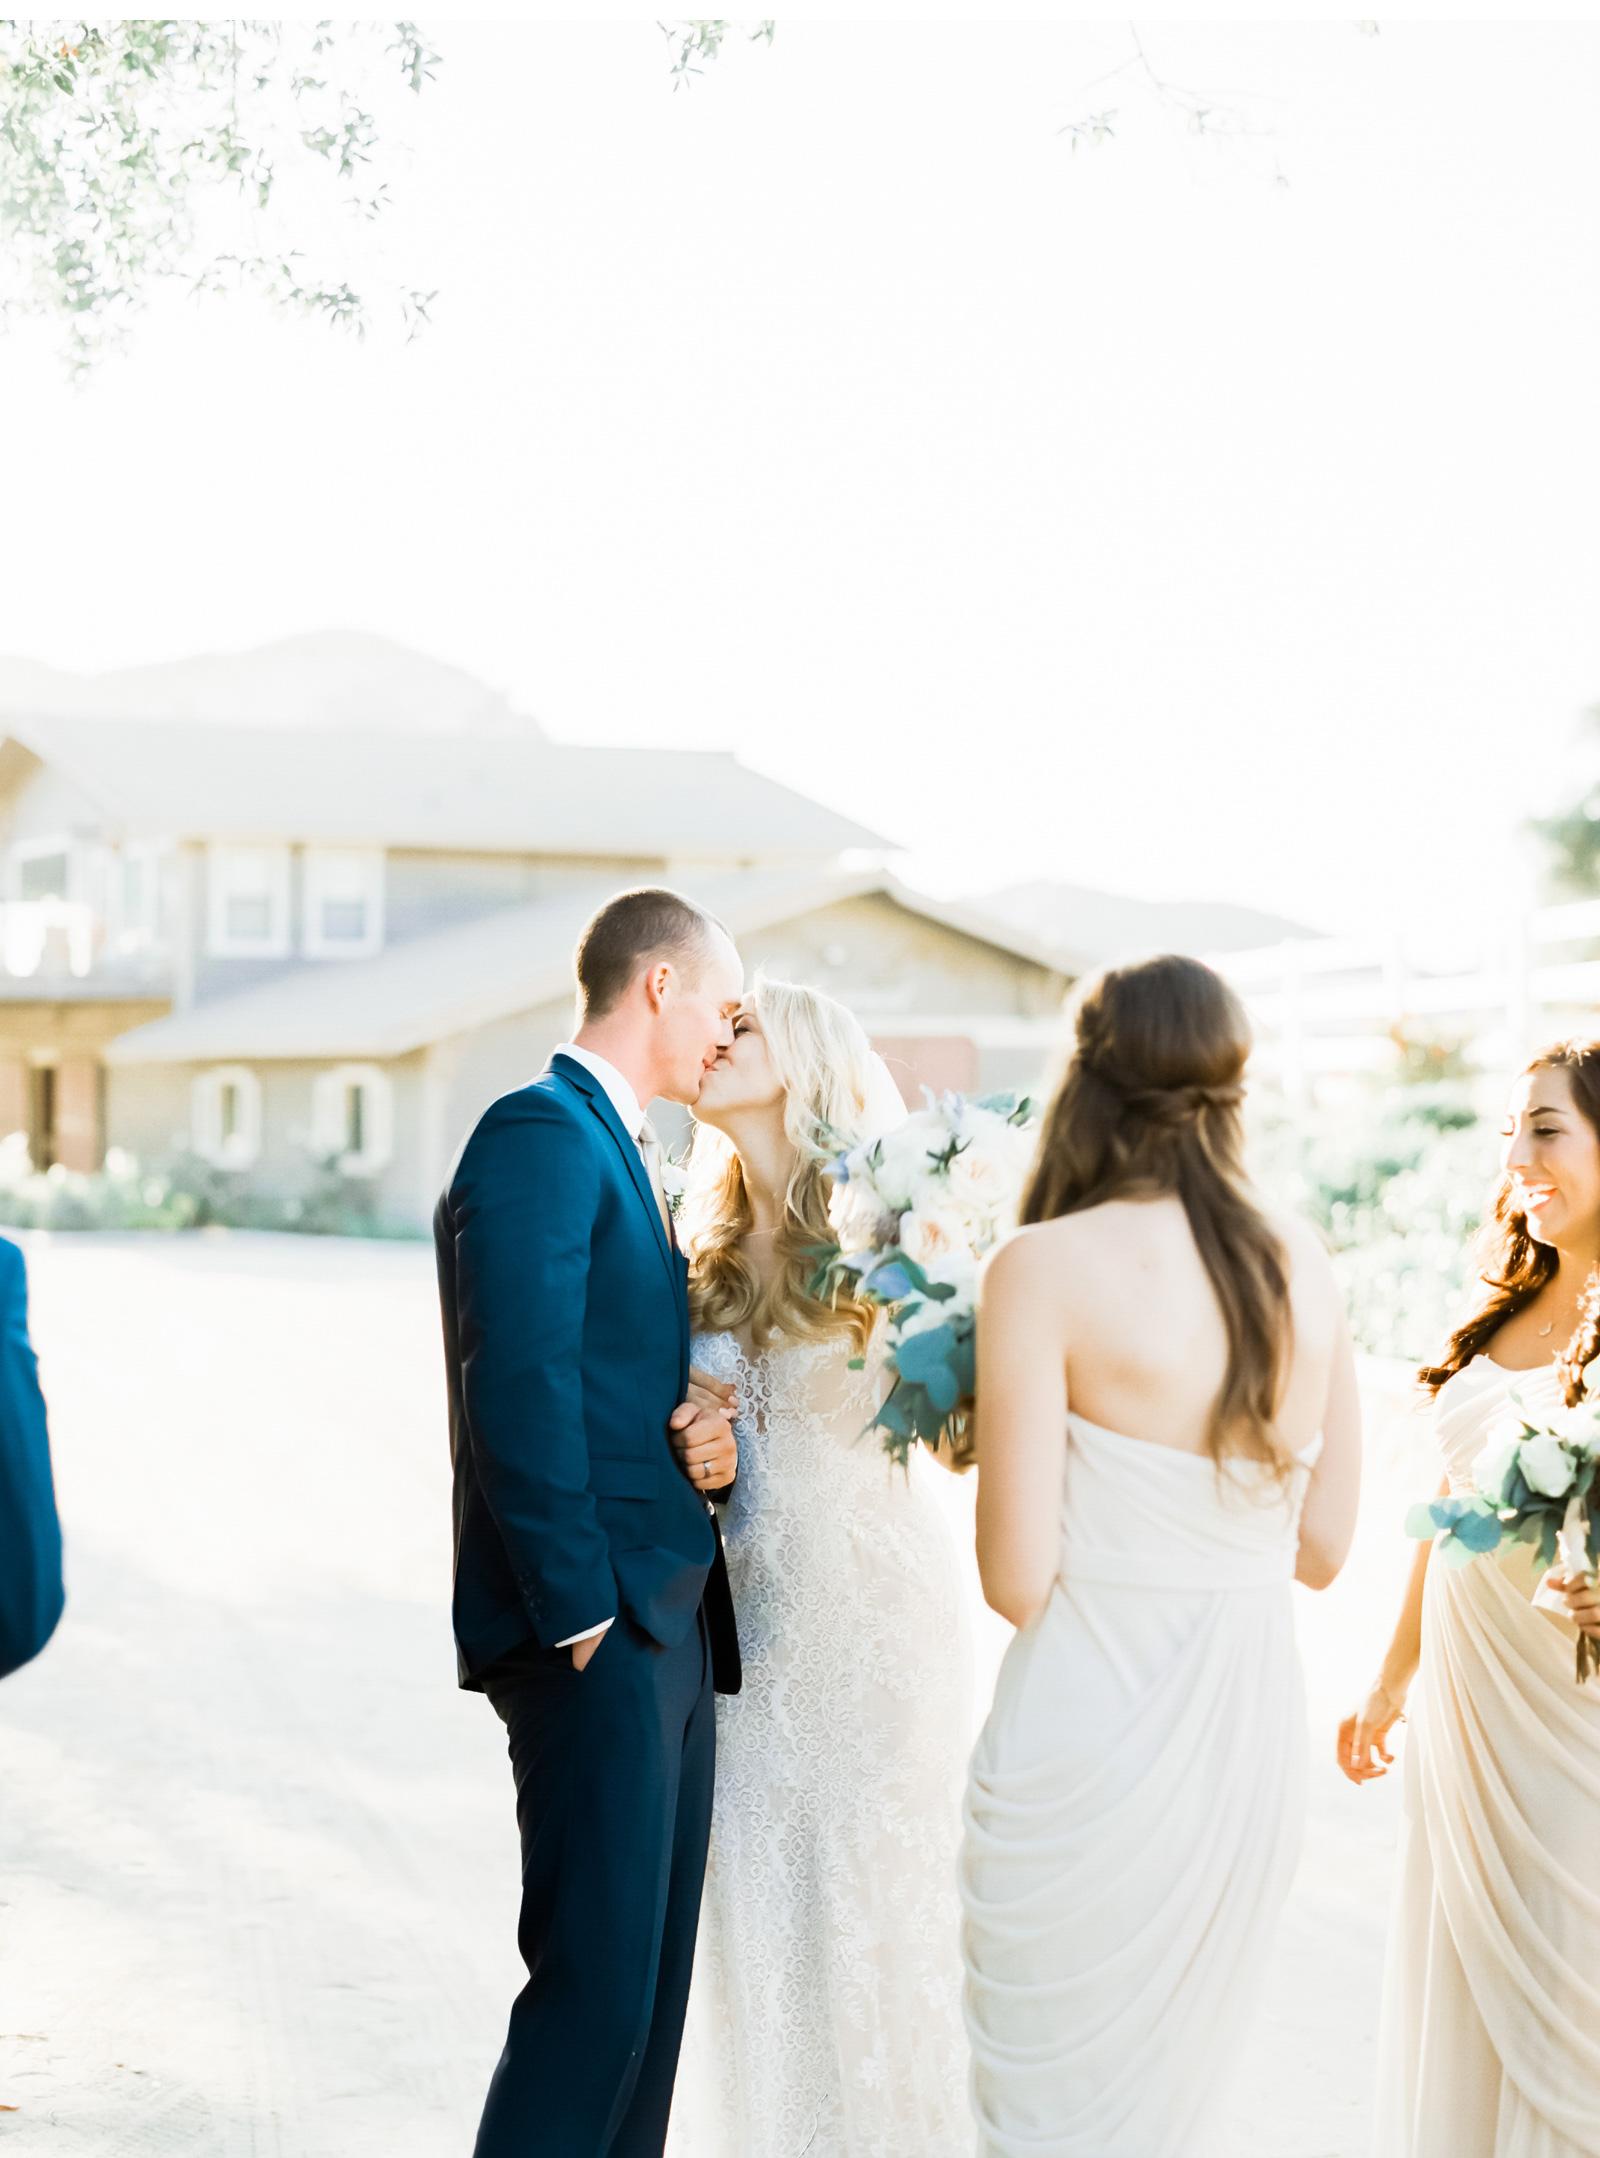 Triunfo-Orange-County-Temecula-Wedding-Photographer-Style-Me-Pretty-Natalie-Schutt-Photography_01.jpg